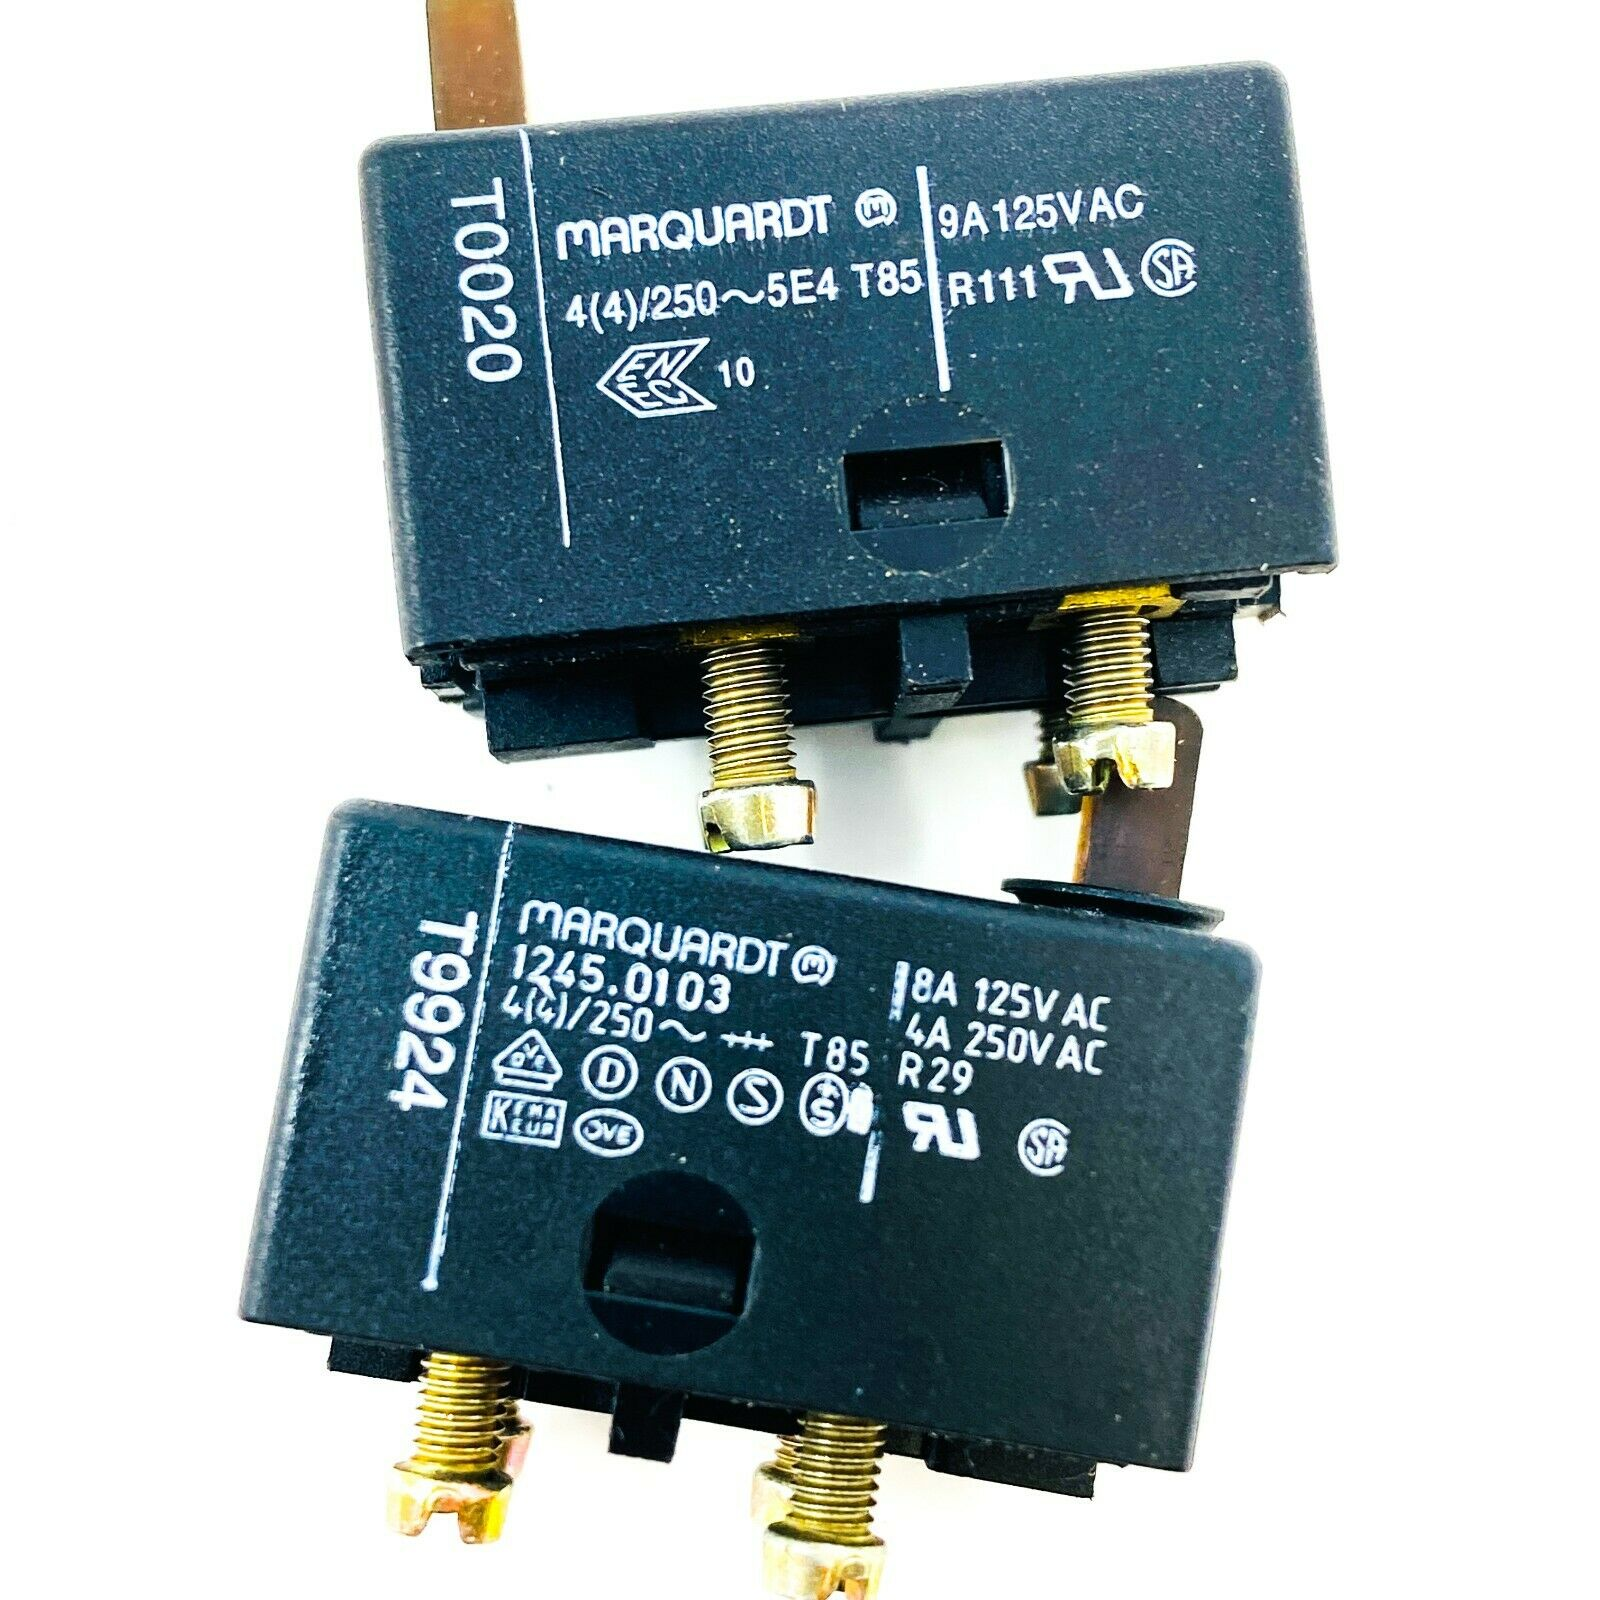 (2 PCS) Flex 195782 Switch fits Porter Cable Electric Sander & Polisher